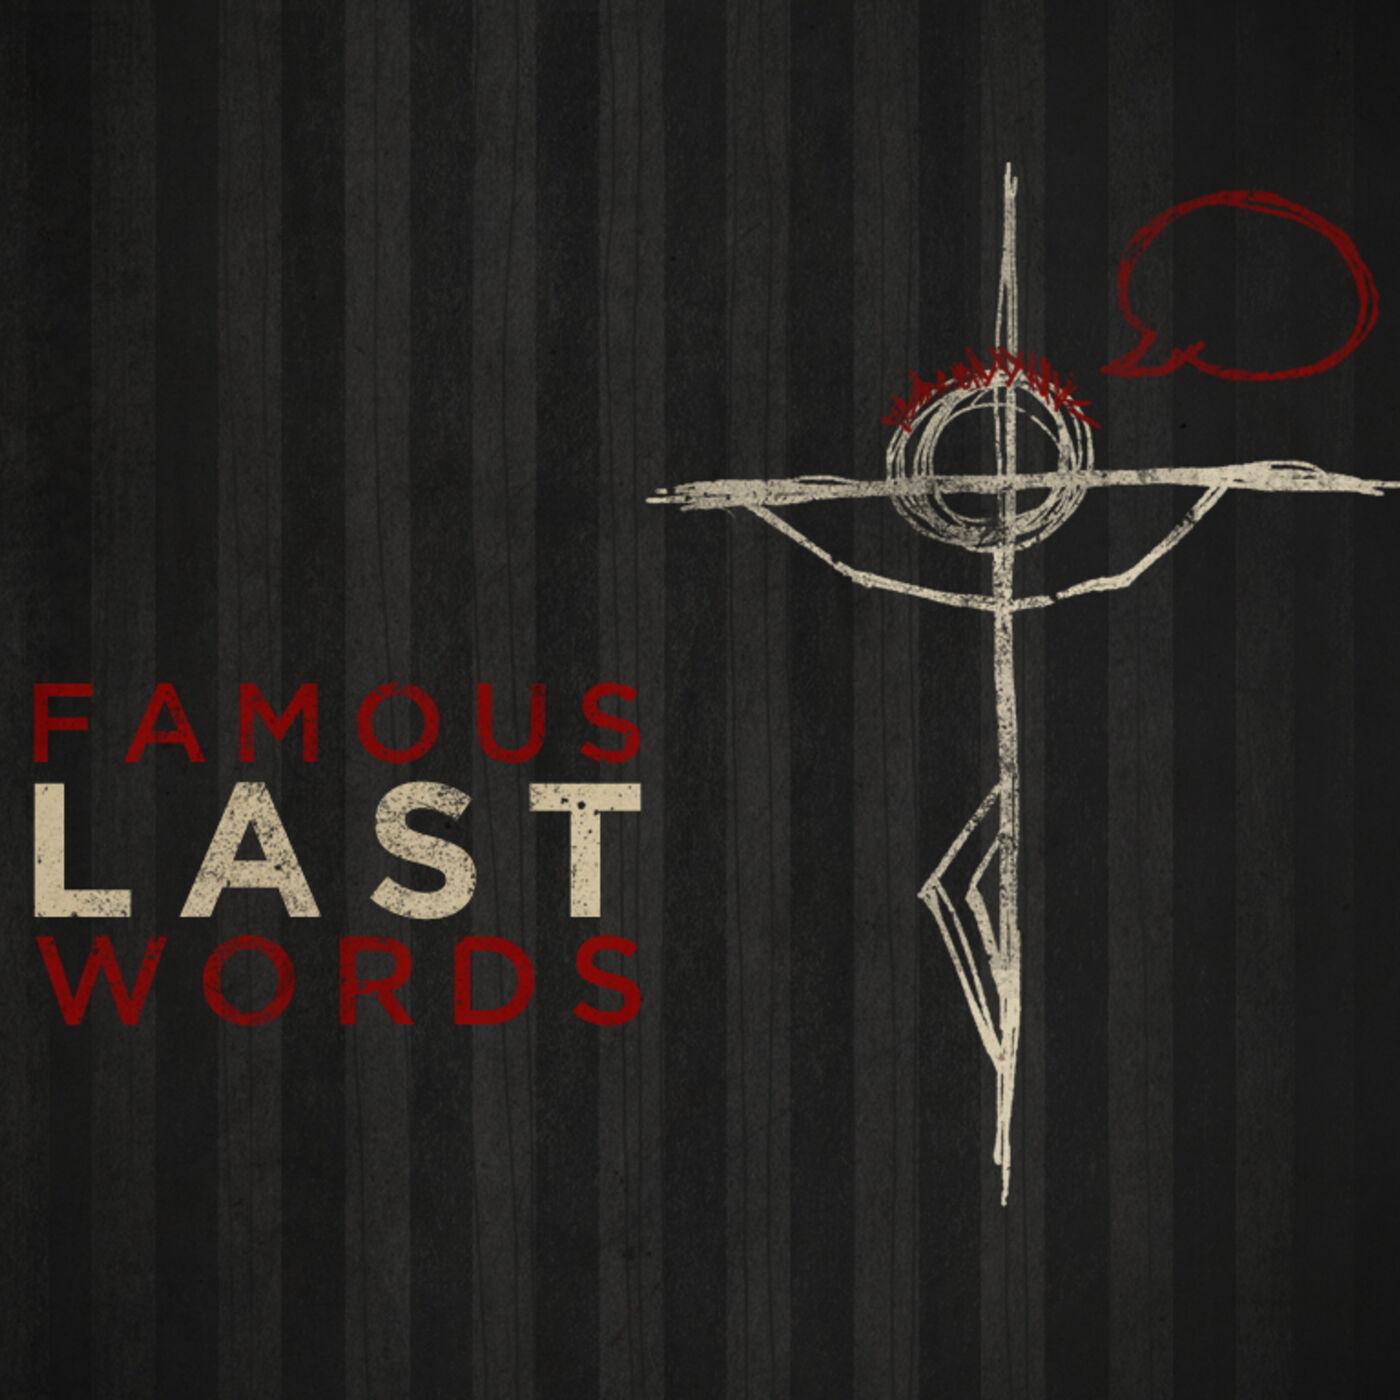 Famous Last Words - Week 3